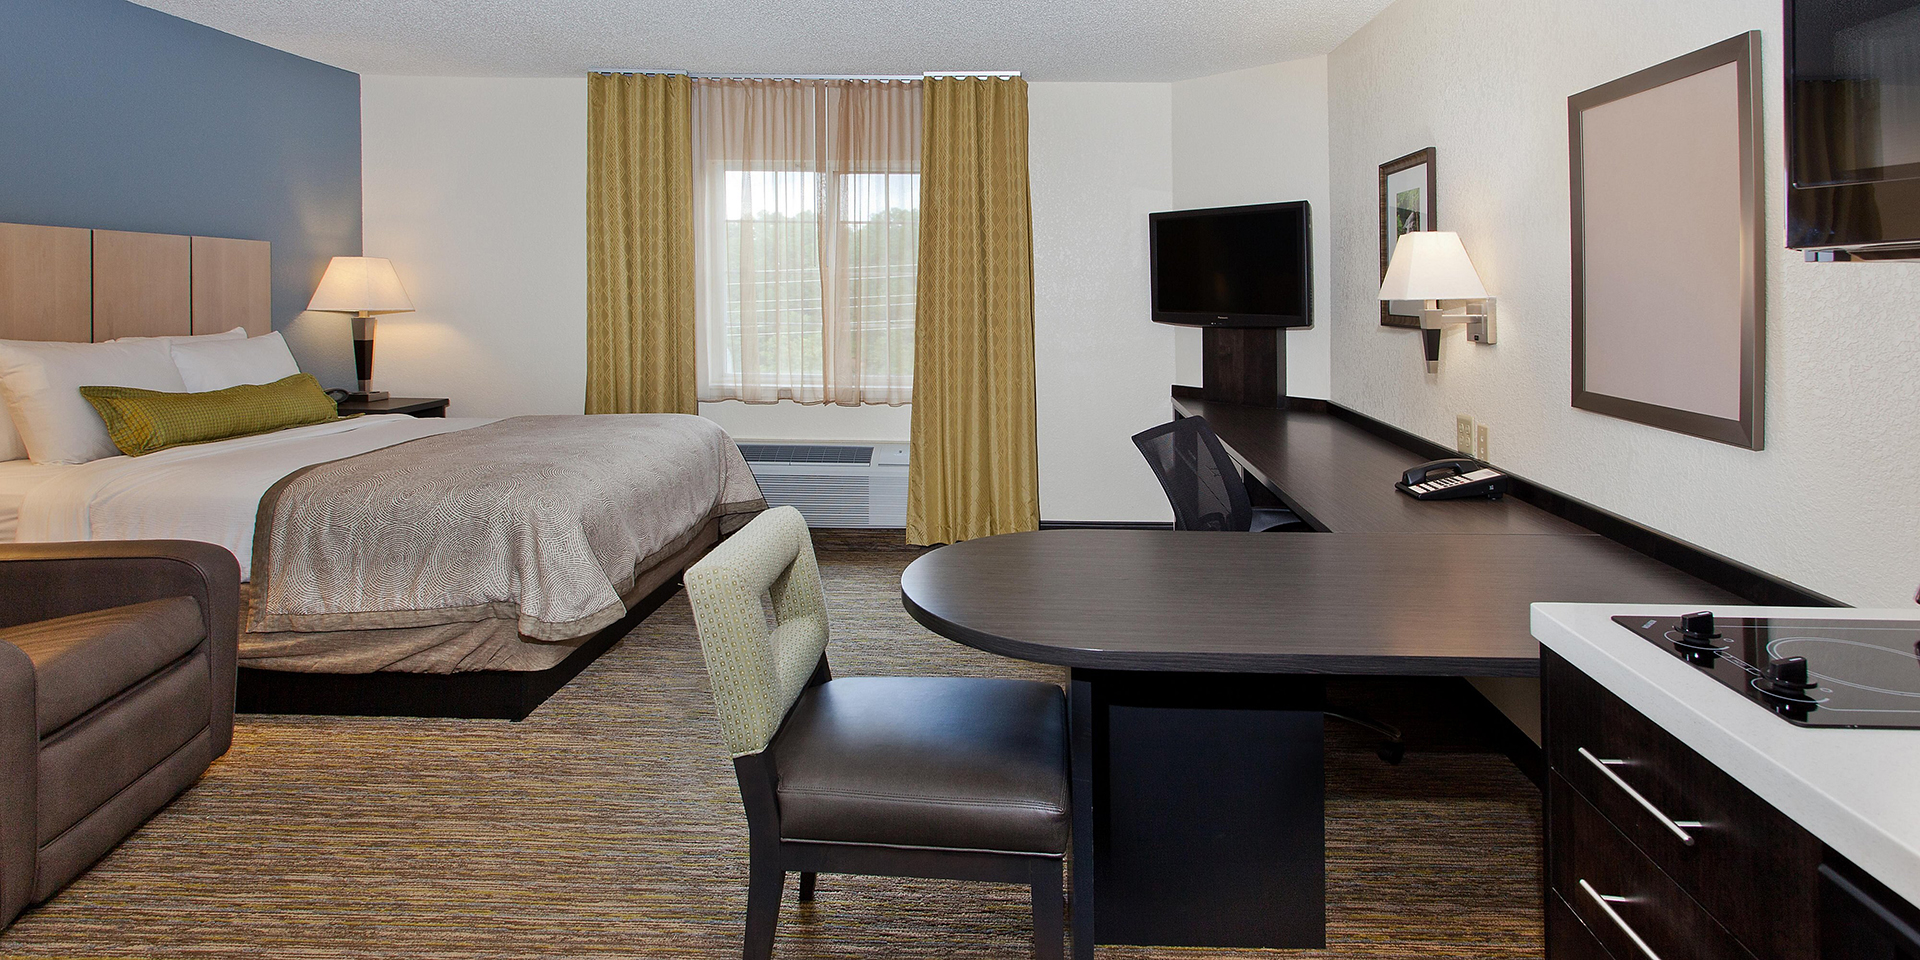 https://www.sonesta.com/us/massachusetts/burlington/sonesta-simply-suites-boston-burlington